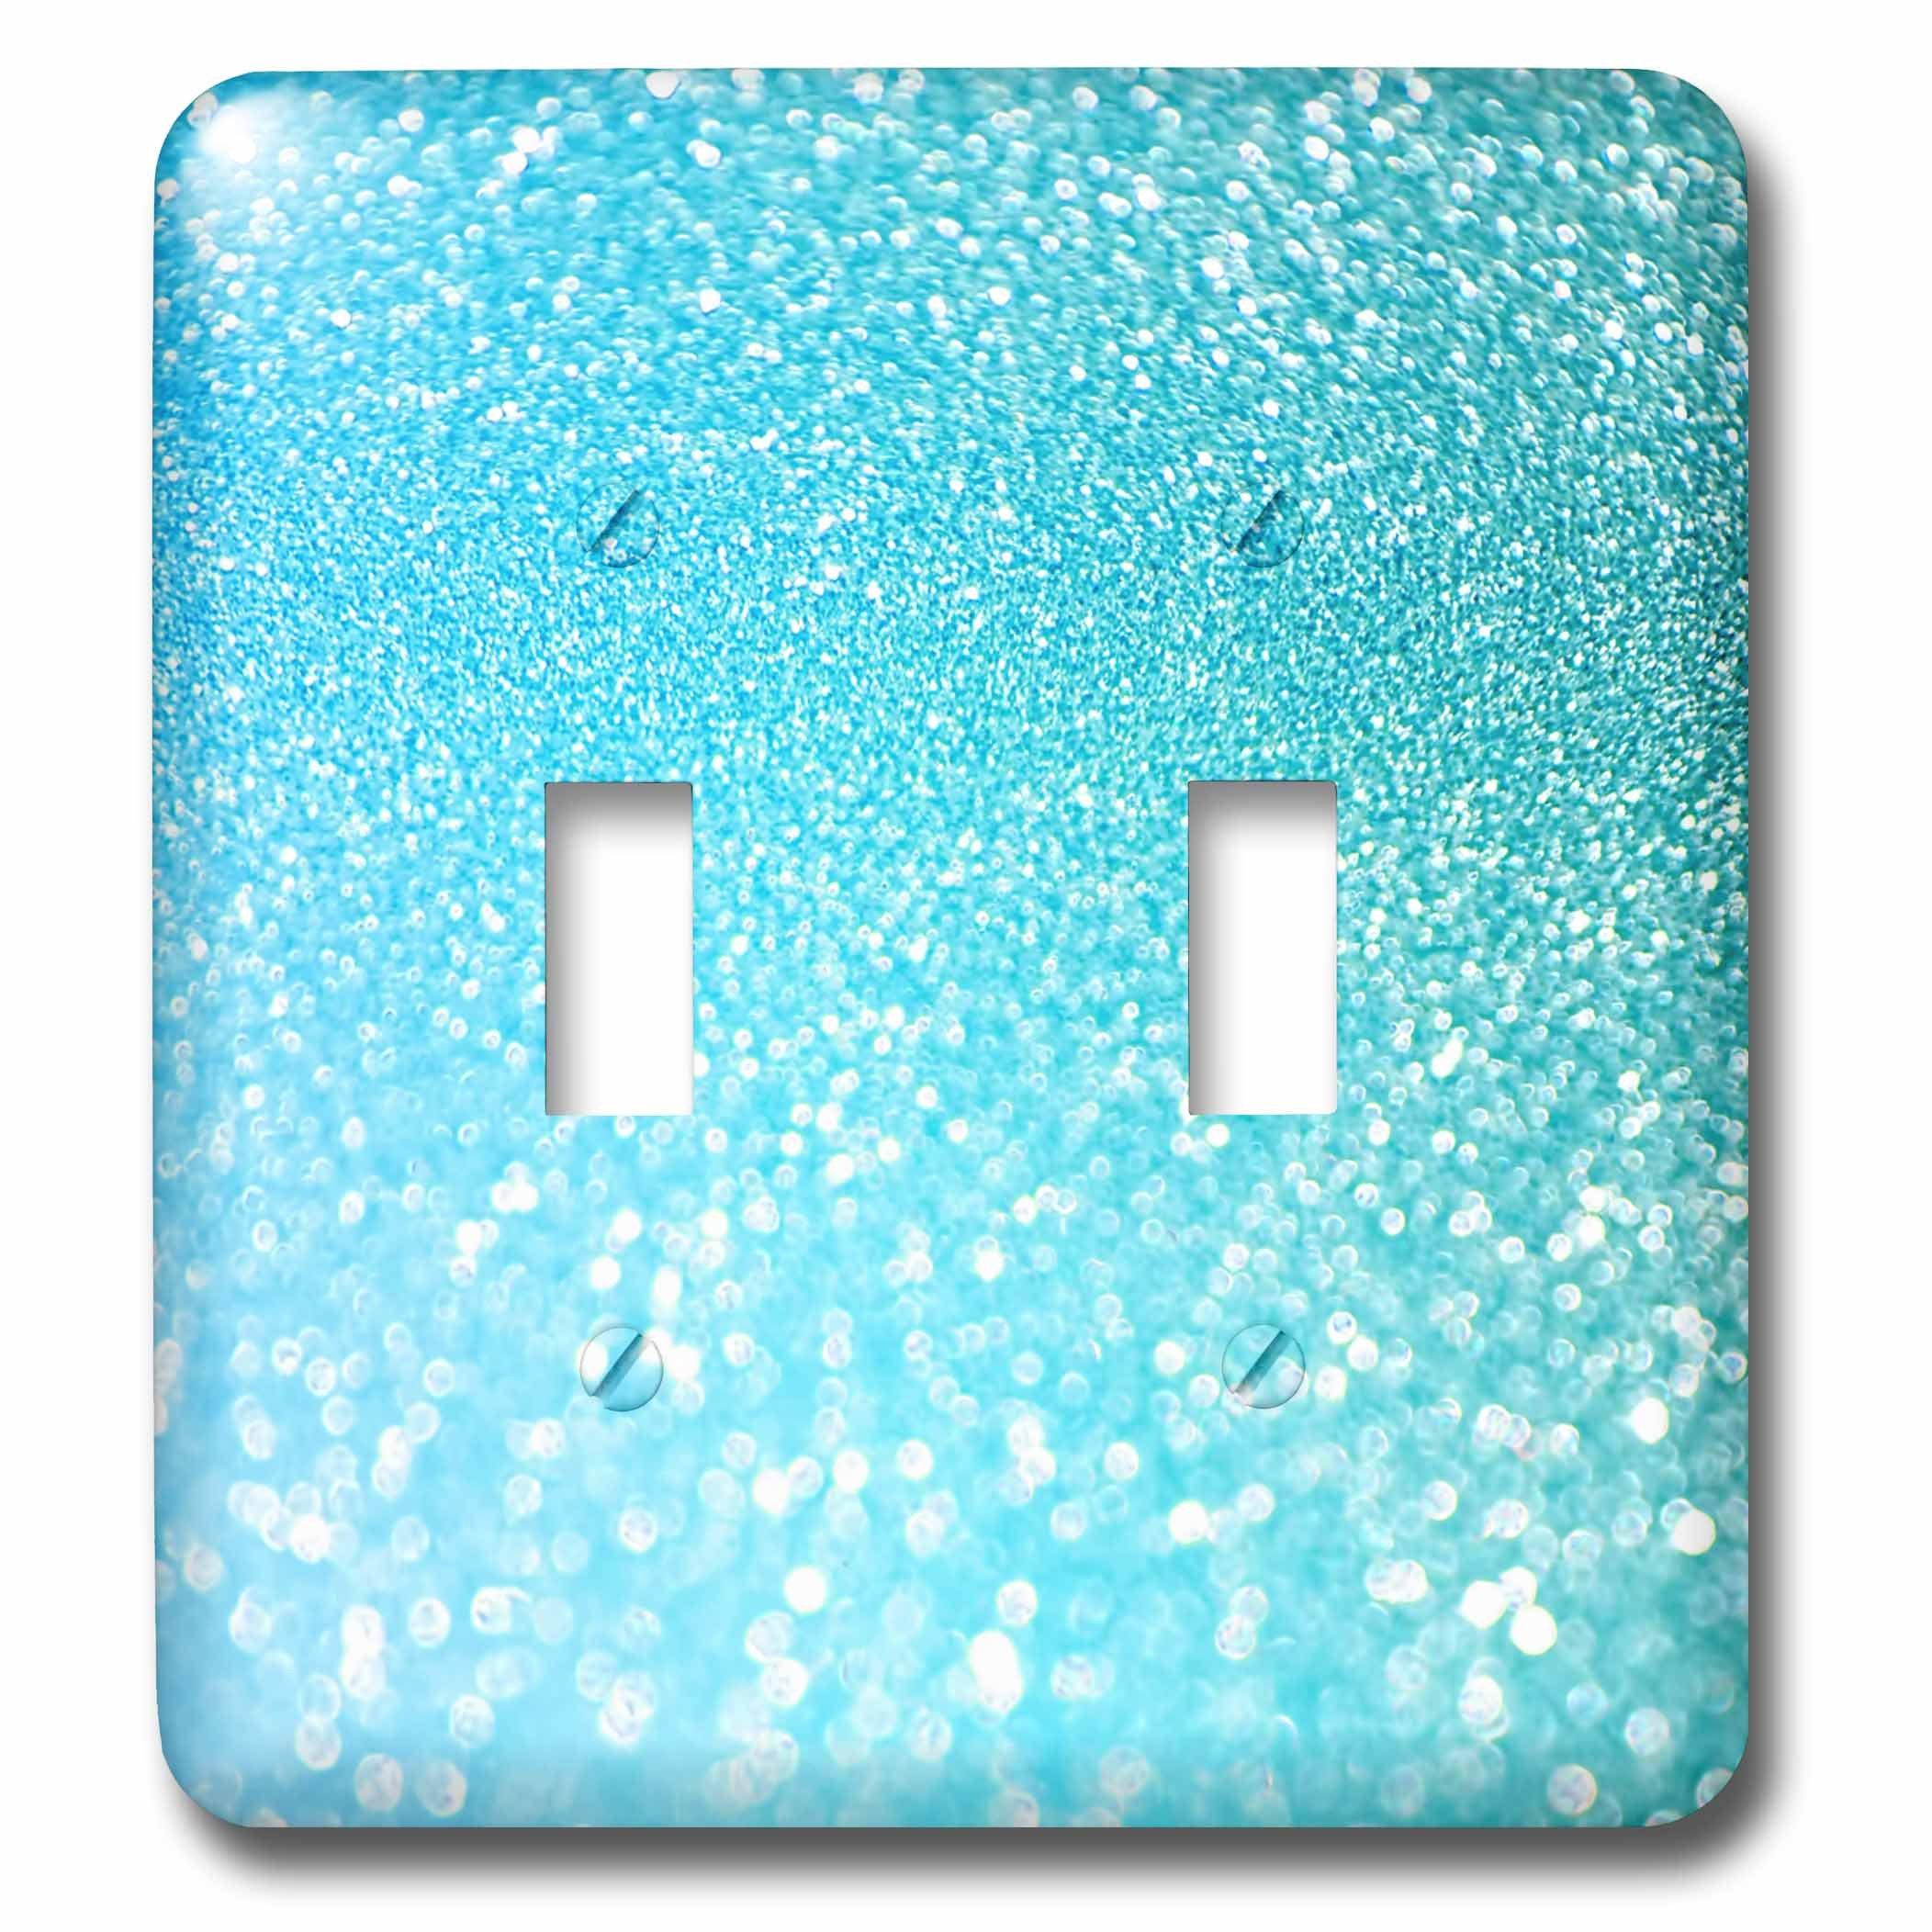 3dRose lsp_266999_2 Sparkling Light Teal Luxury Elegant Mermaid Glitter Effect Art Print Toggle Switch, Mixed